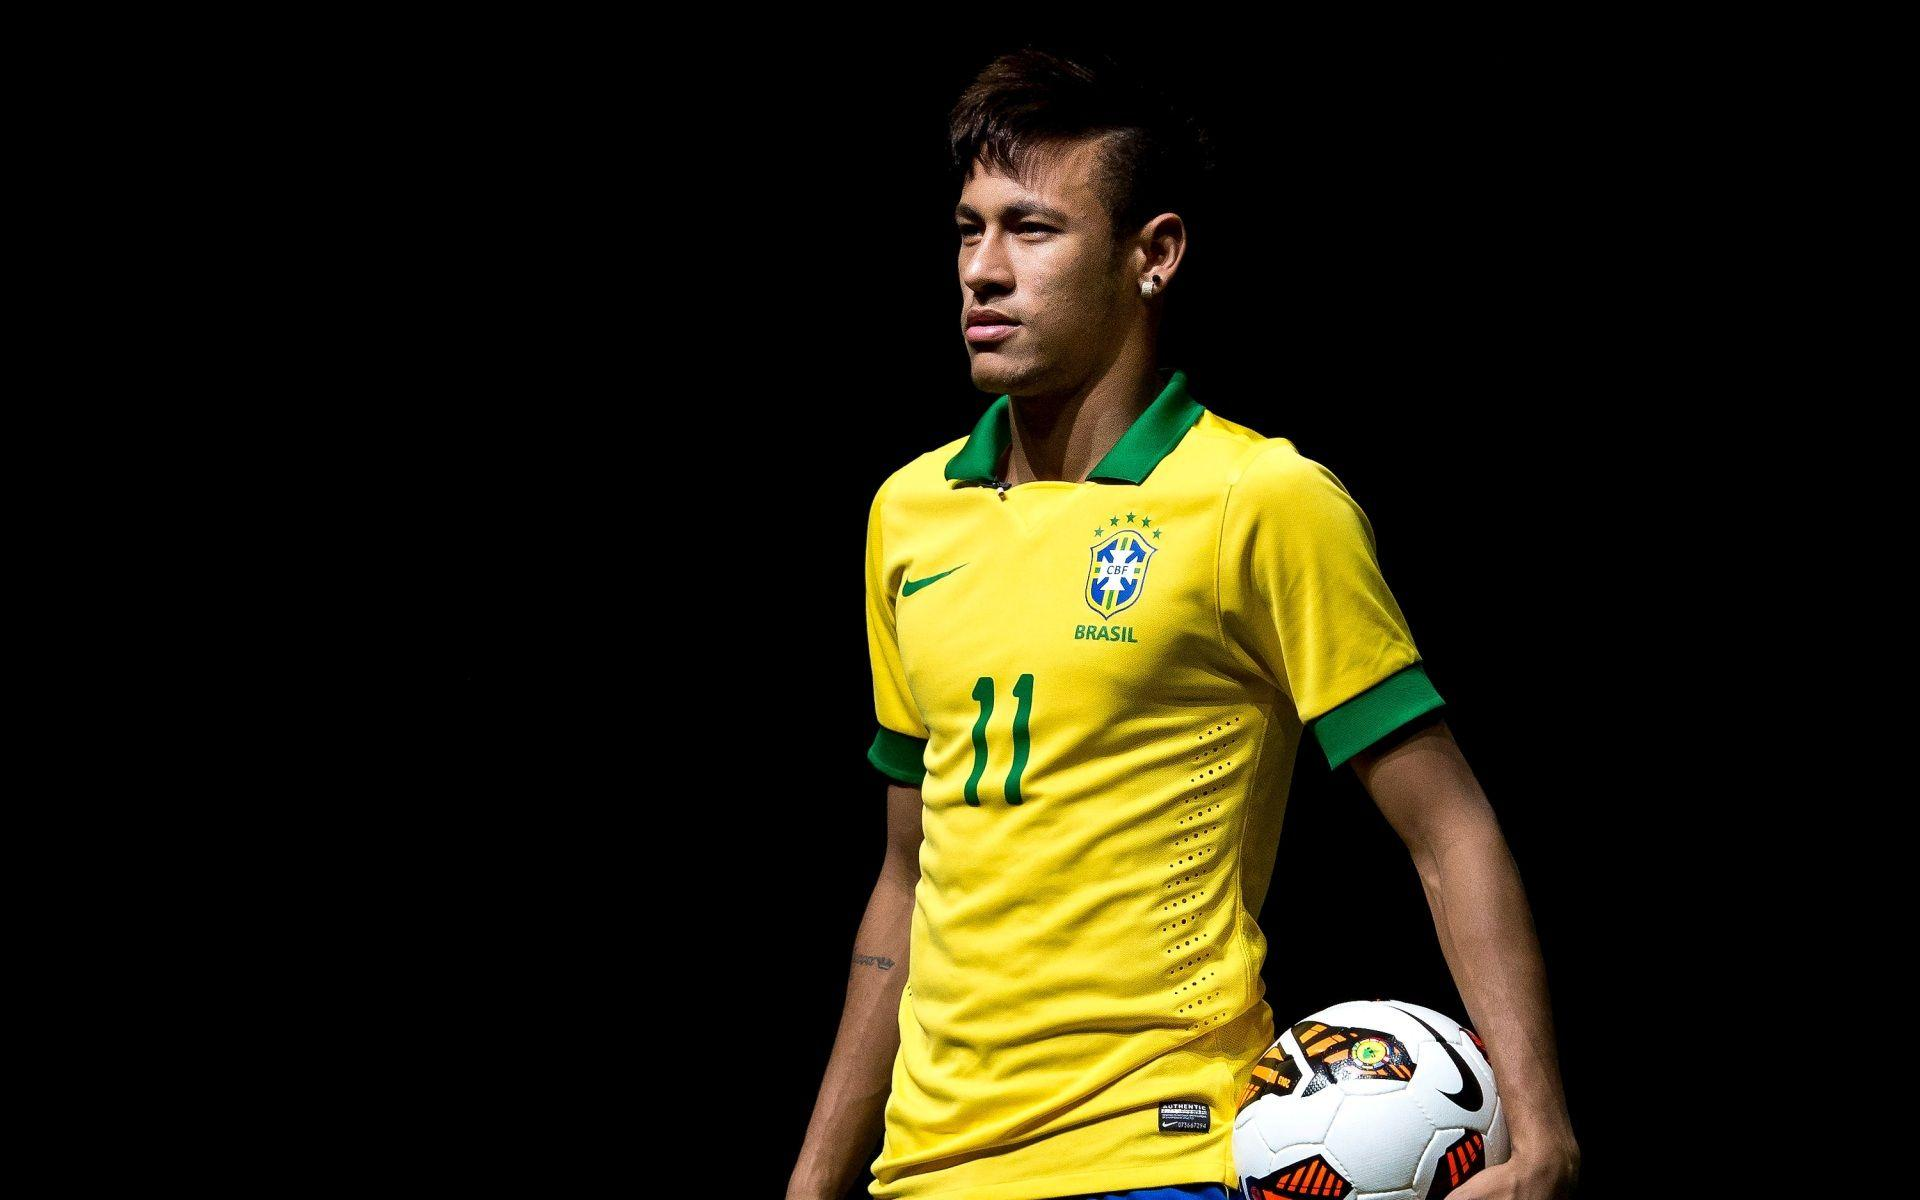 Hd wallpaper neymar - Neymar Wallpapers 2015 Hd Wallpaper Cave